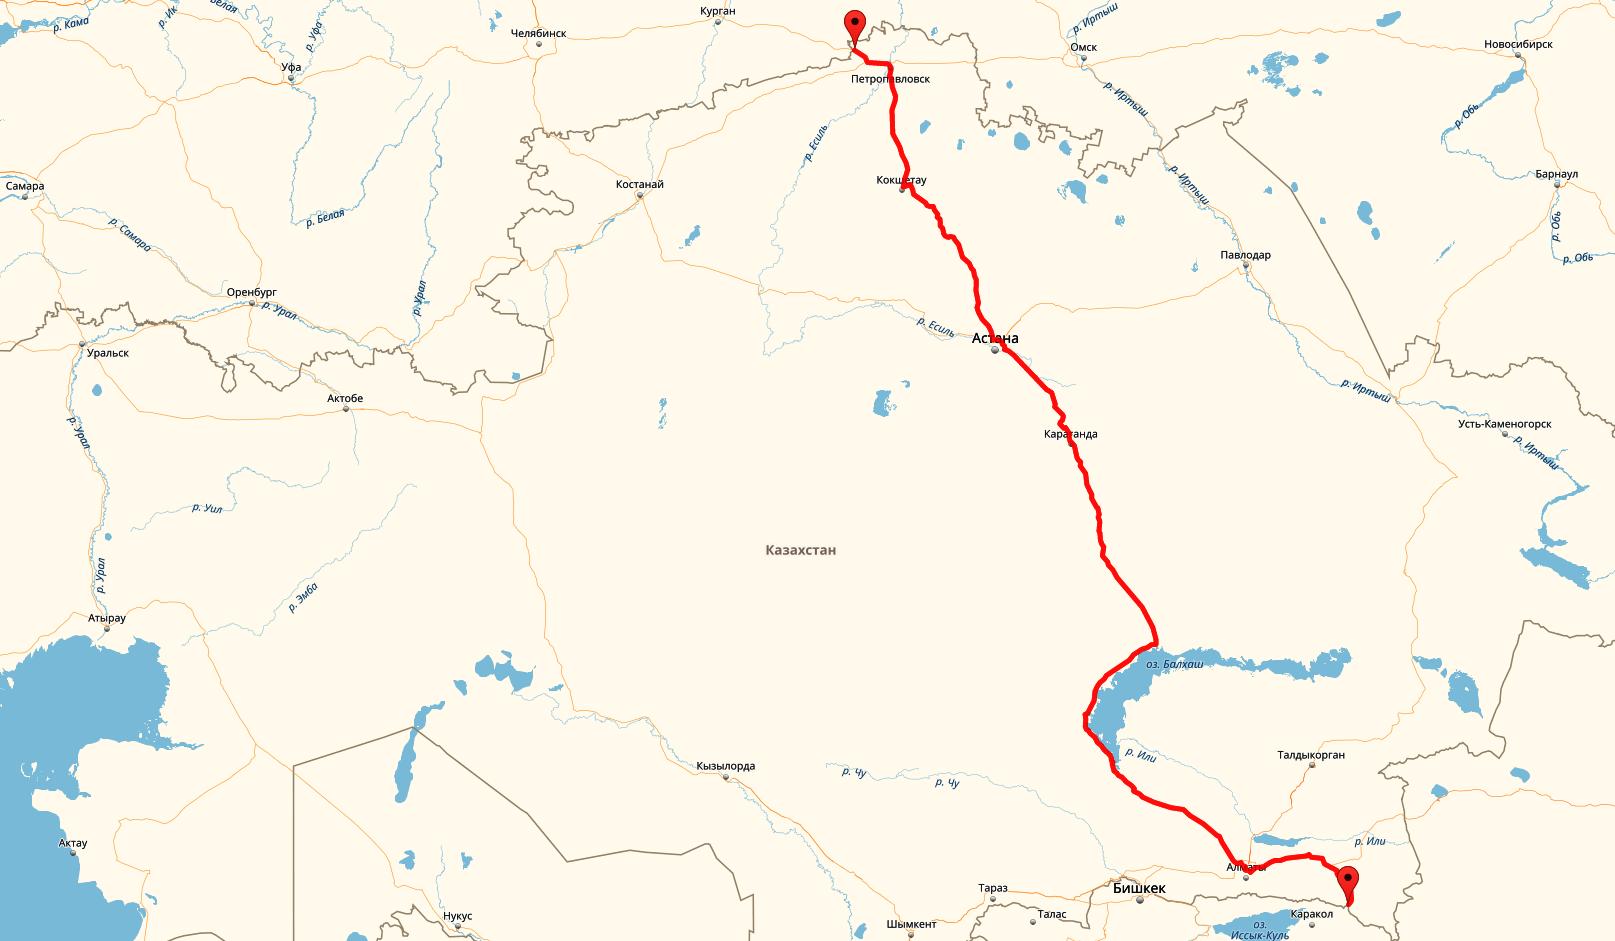 Маршрут по территории Казахстана